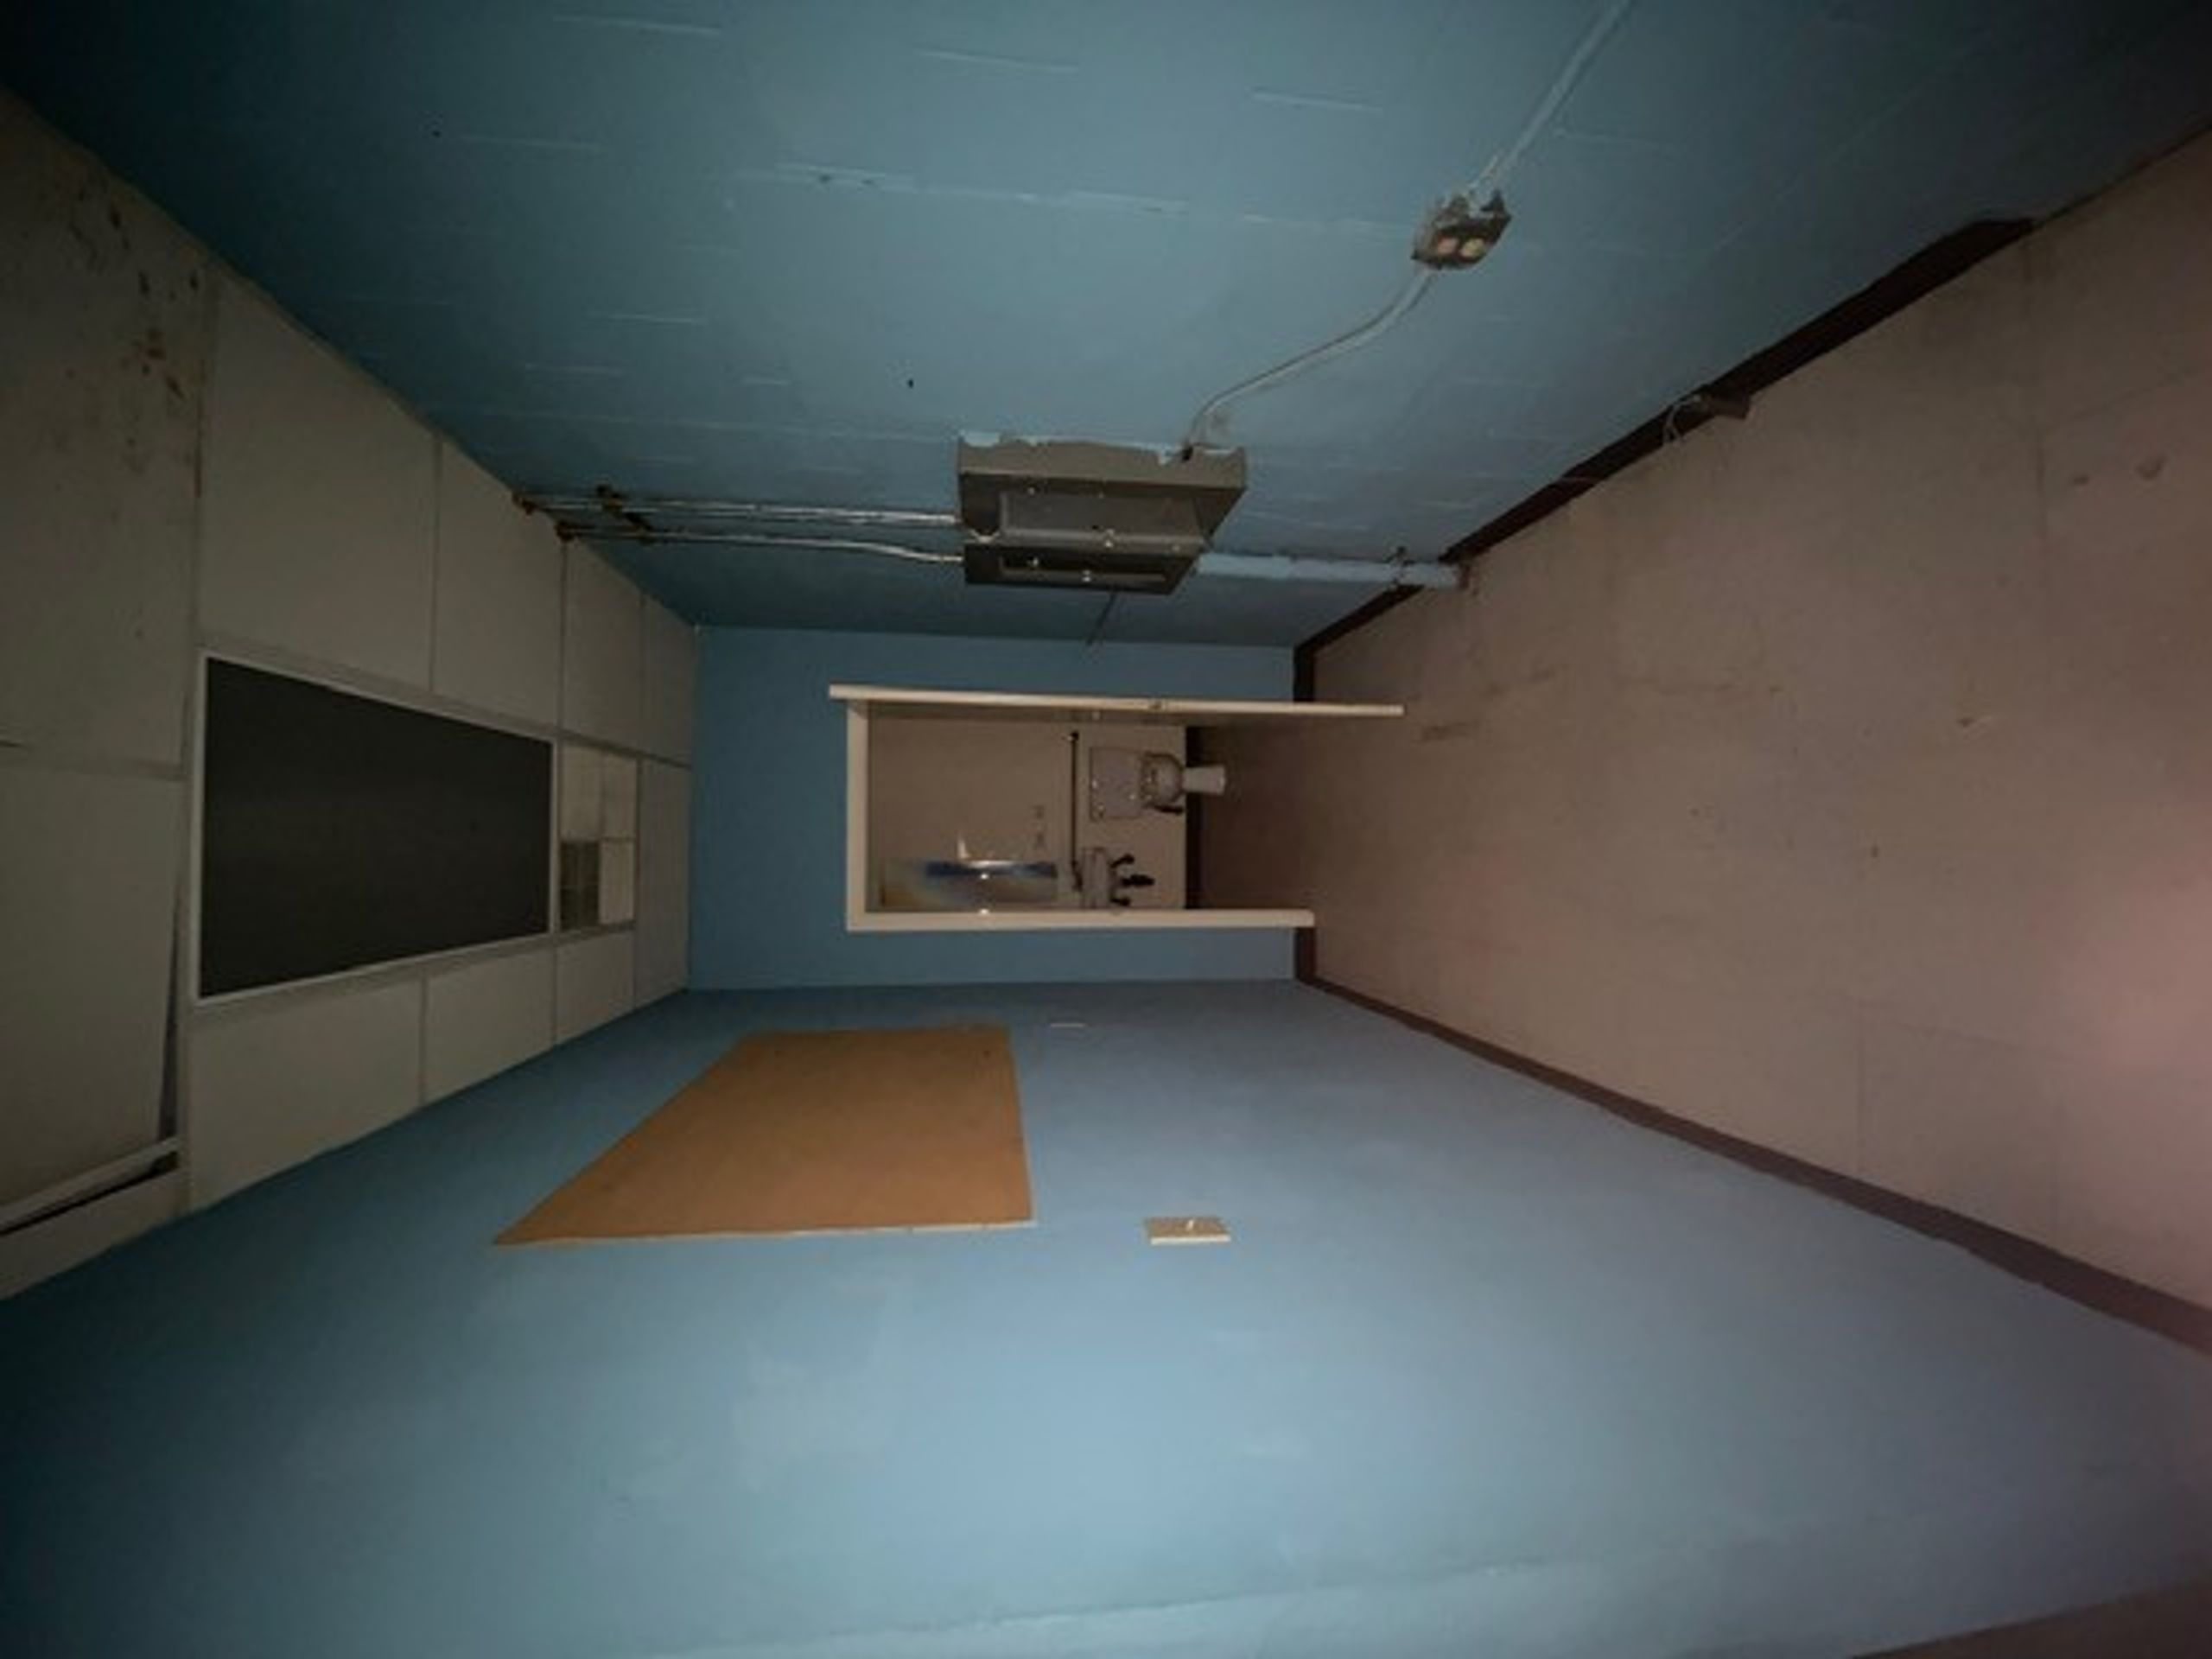 50x25 Warehouse self storage unit